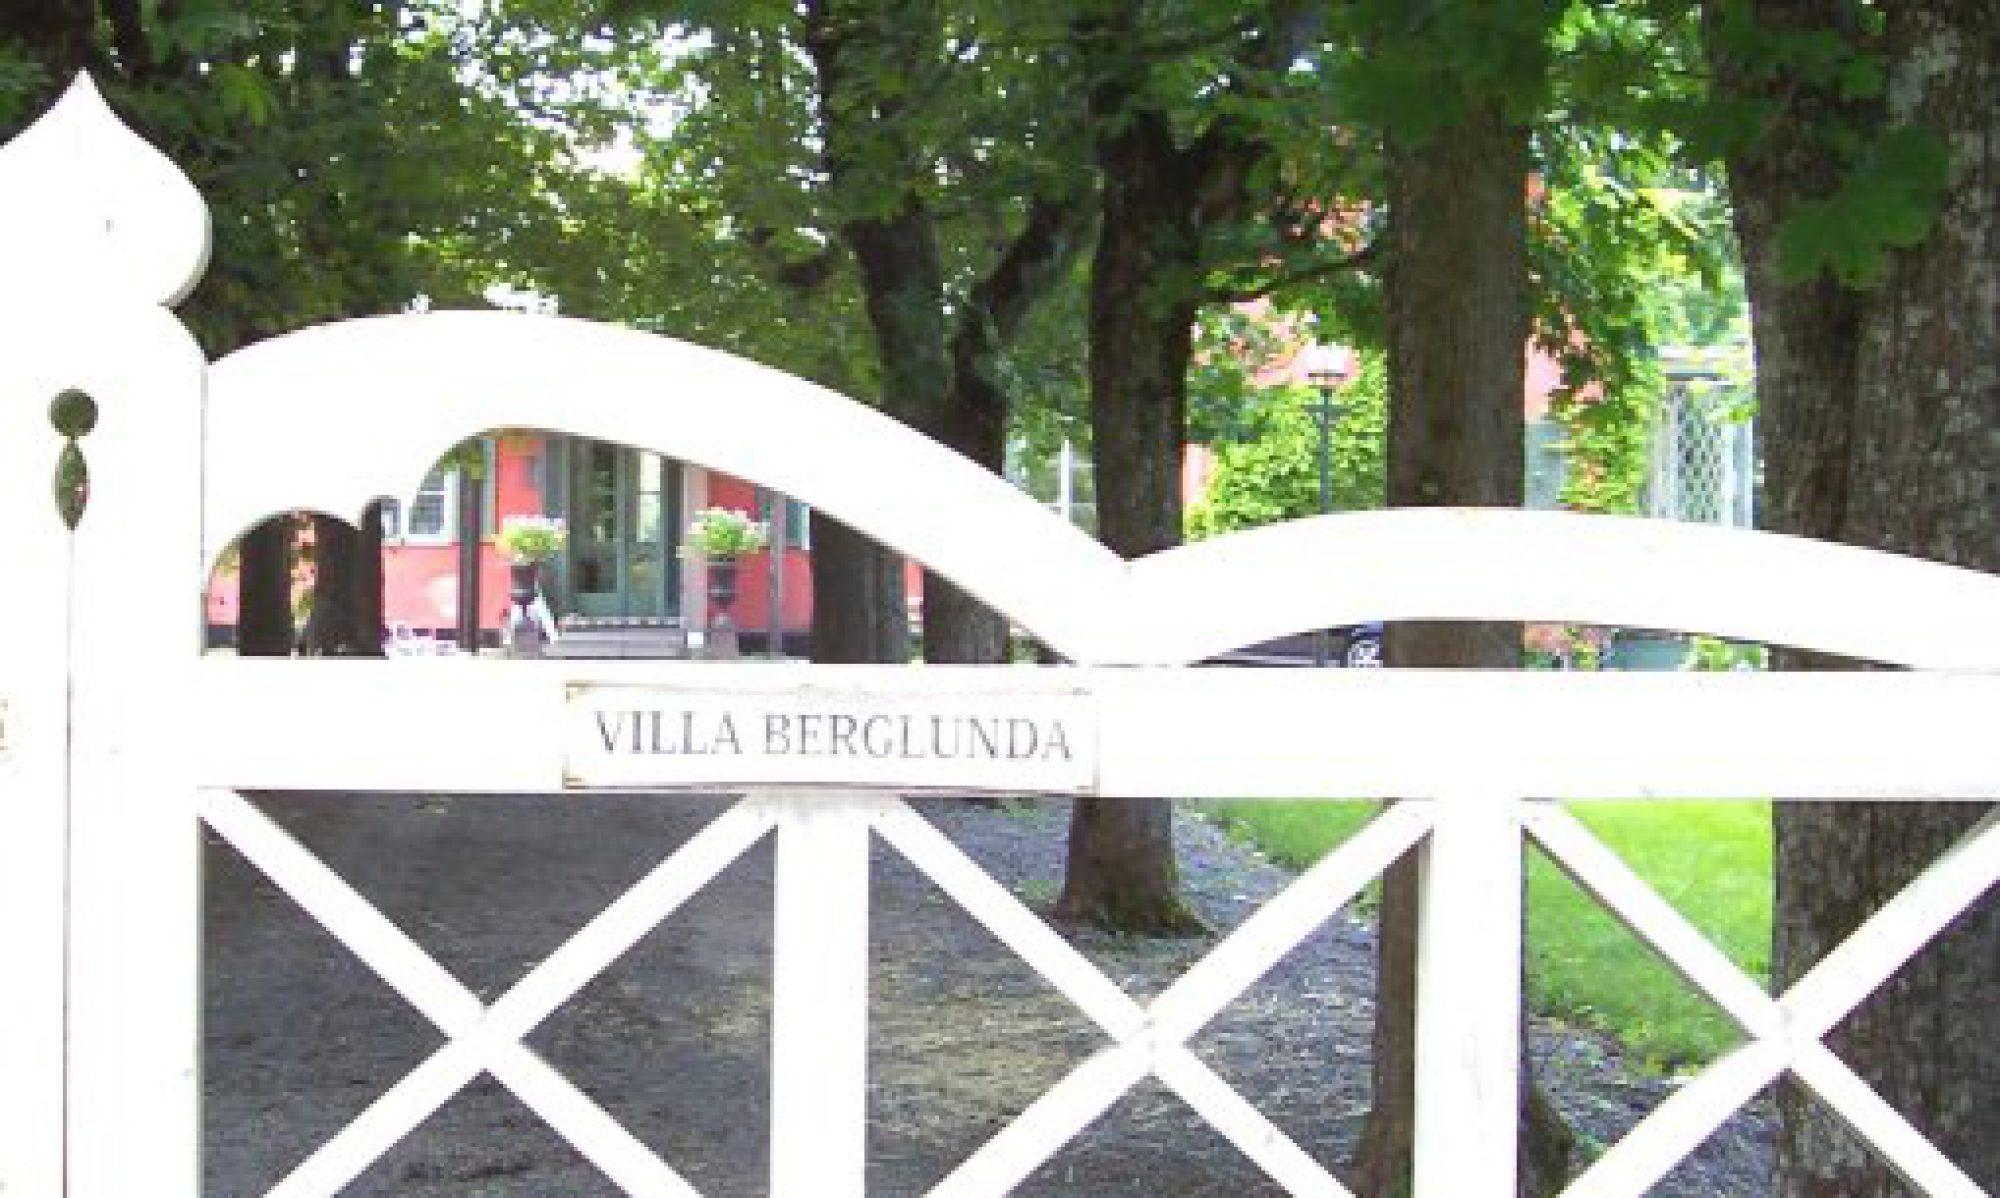 http://www.villaberglunda.se/wp-content/uploads/2017/01/cropped-Villa-berglunda-3-2.jpg